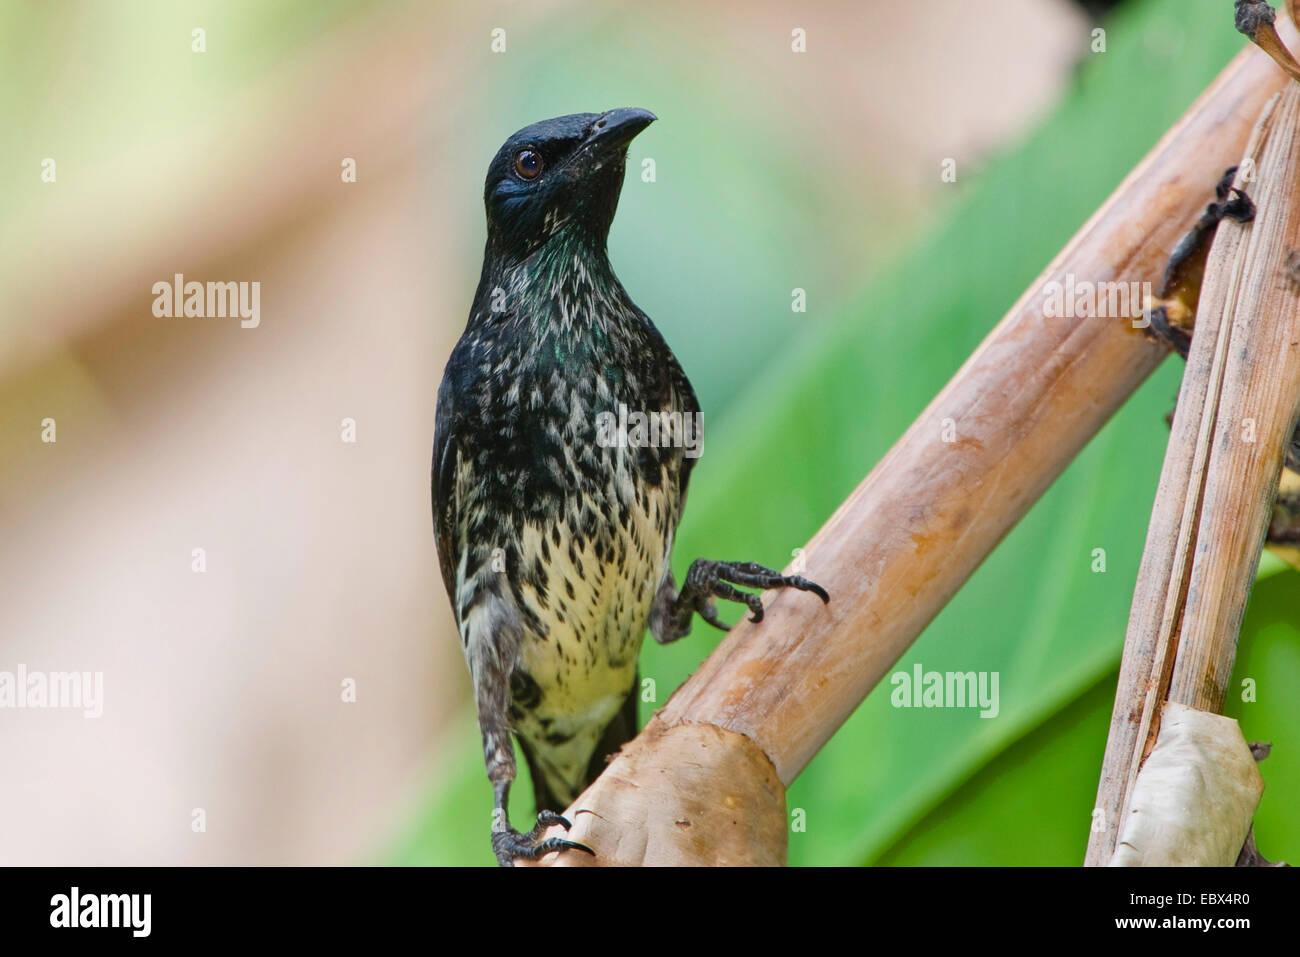 Philippine glossy starling (Aplonis panayensis), young individual, India, Andaman Islands - Stock Image